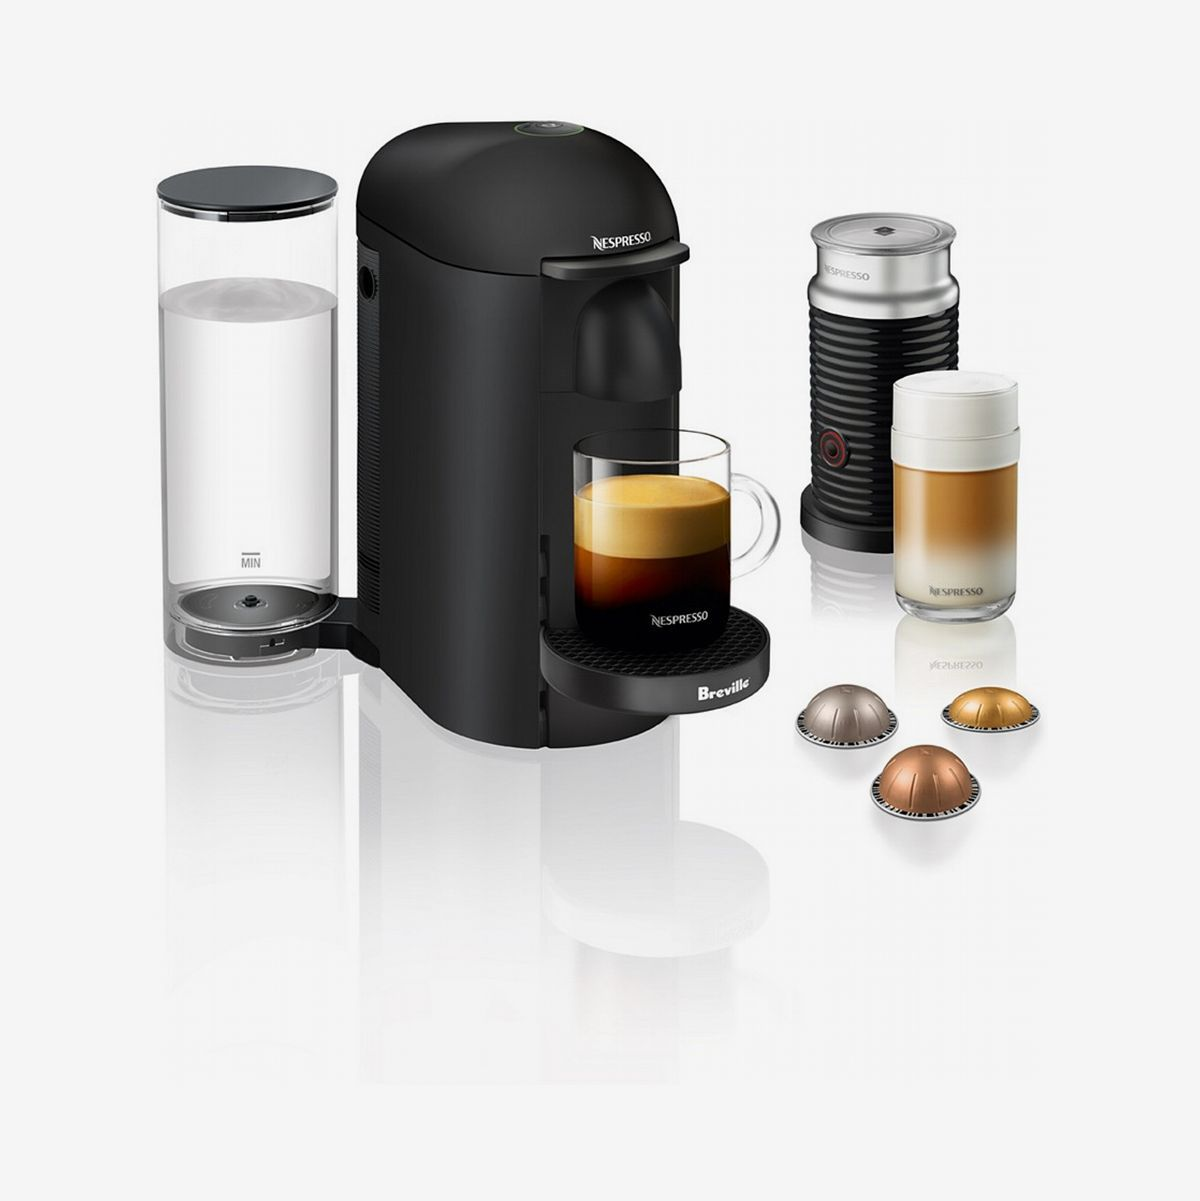 An espresso machine with capsules